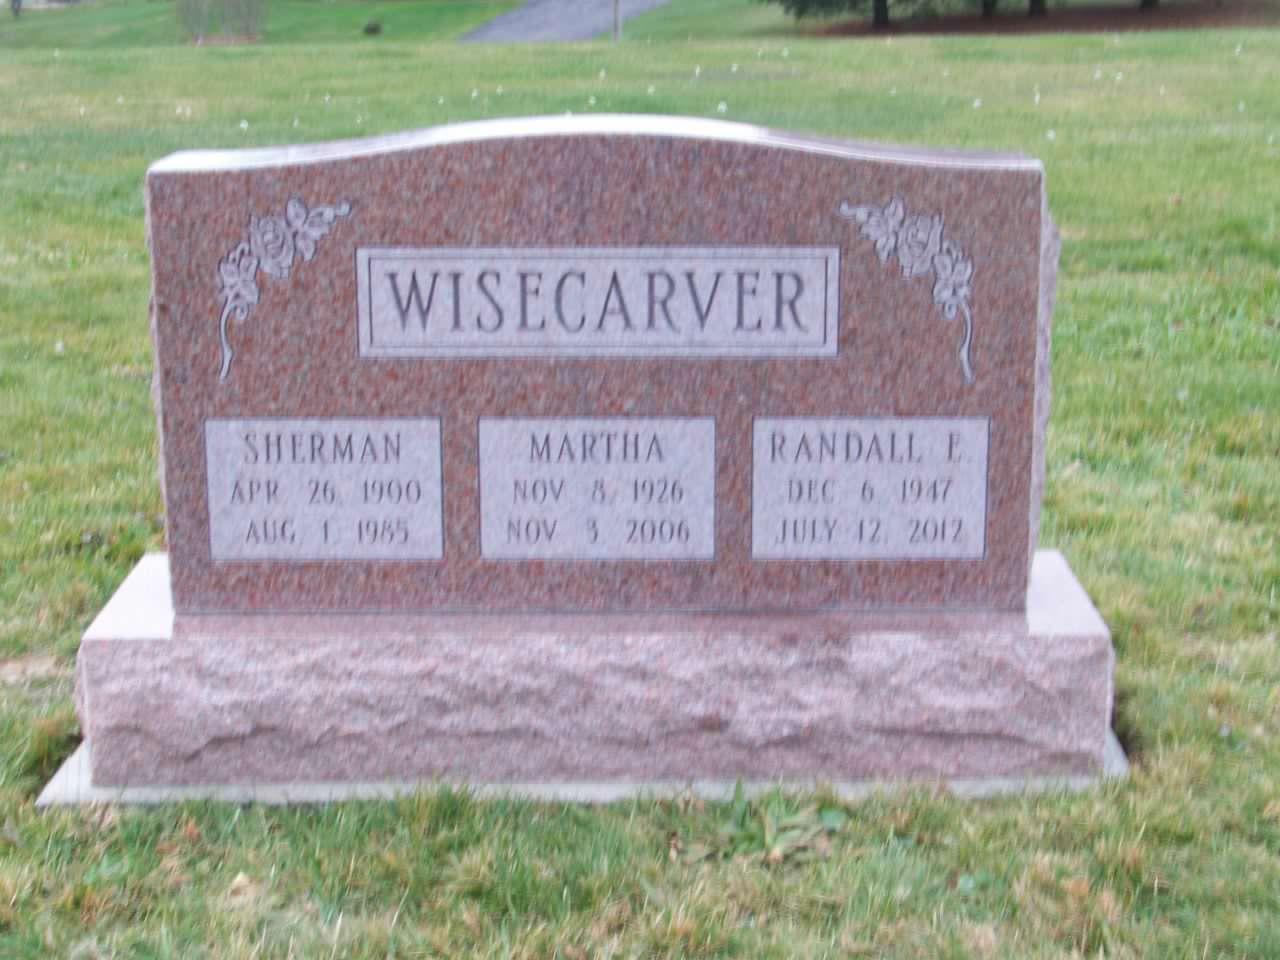 Wisecarver, Sherman, Marthe